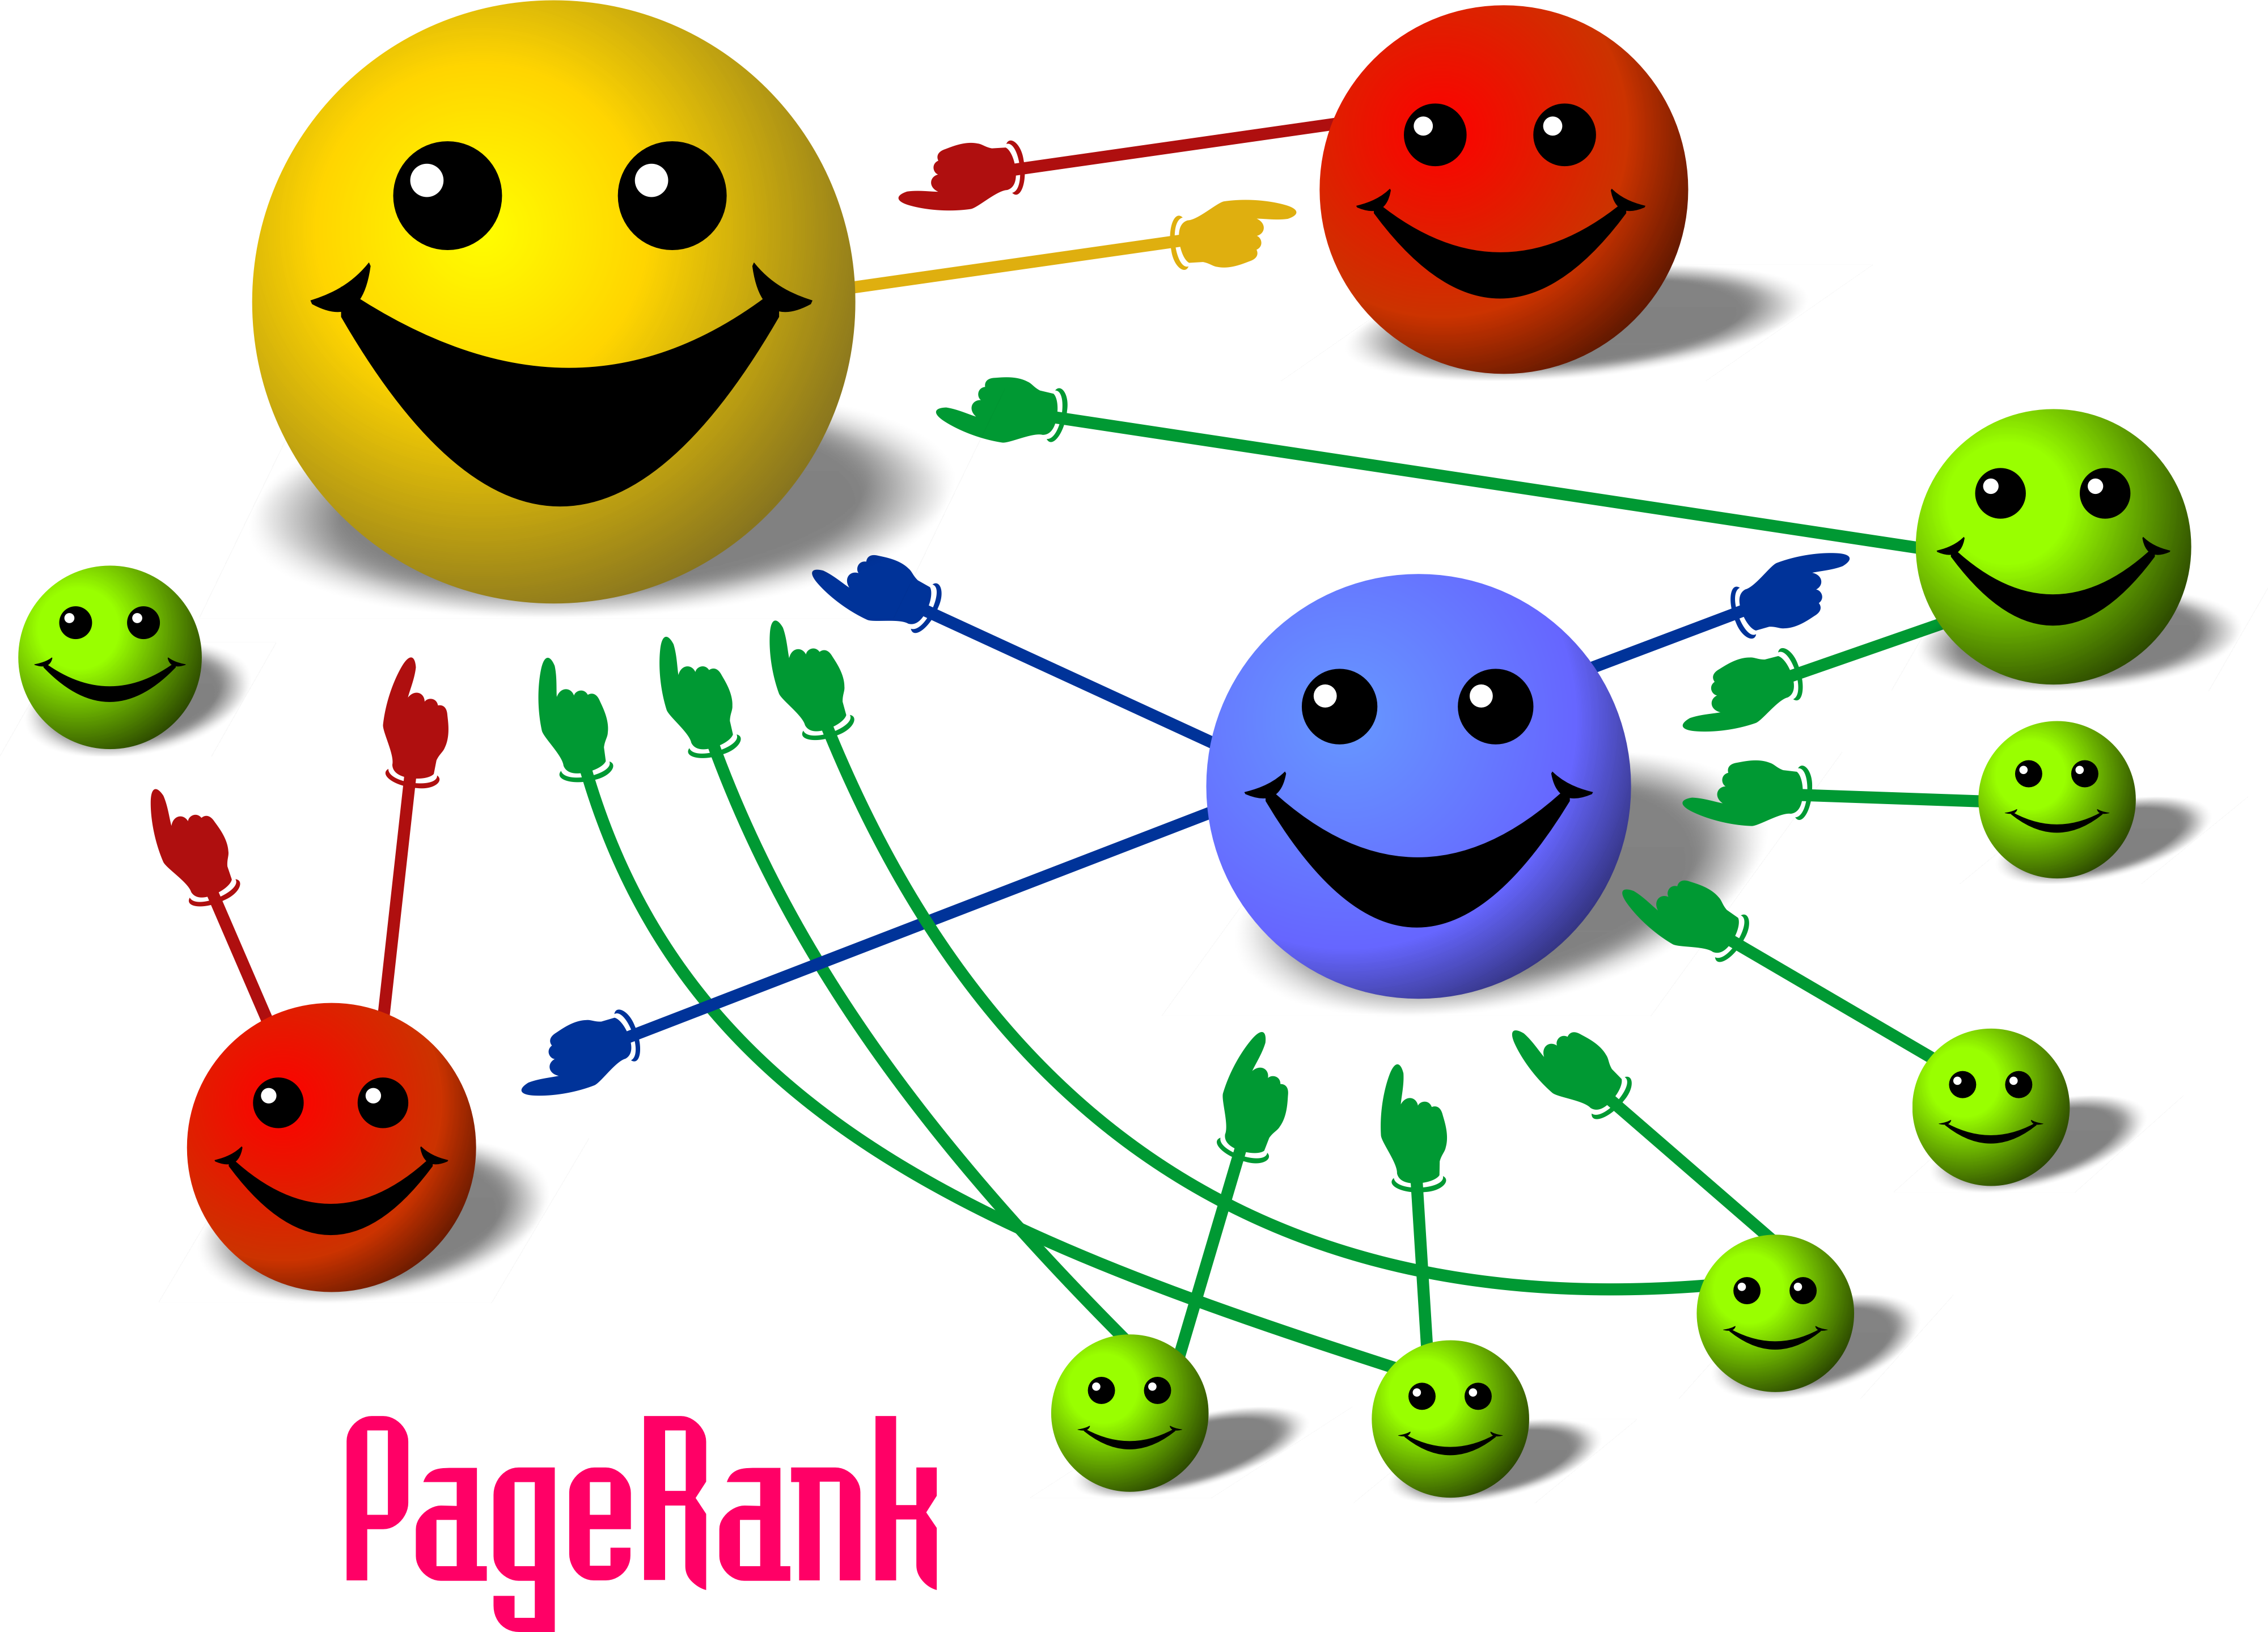 Free High pr Social bookmarking Websites list 2016/2017